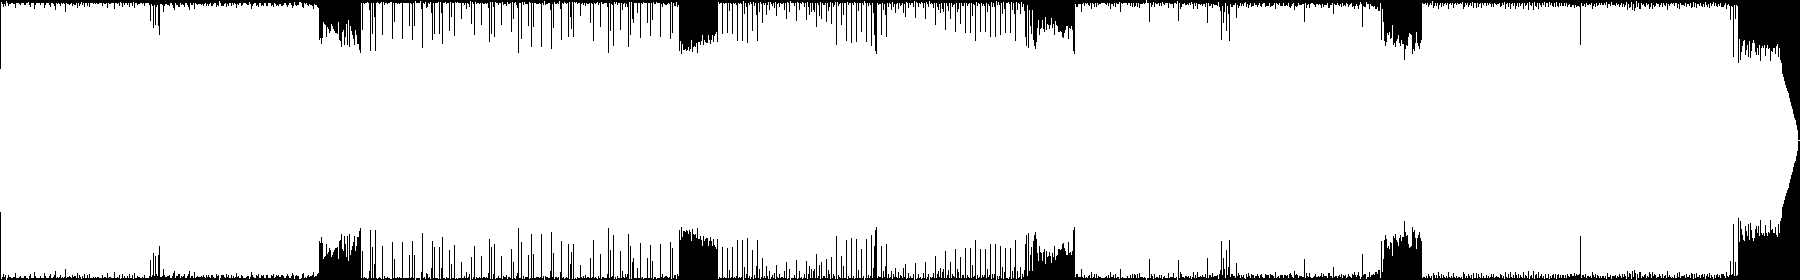 NUDE MELODIC TECHNO audio waveform